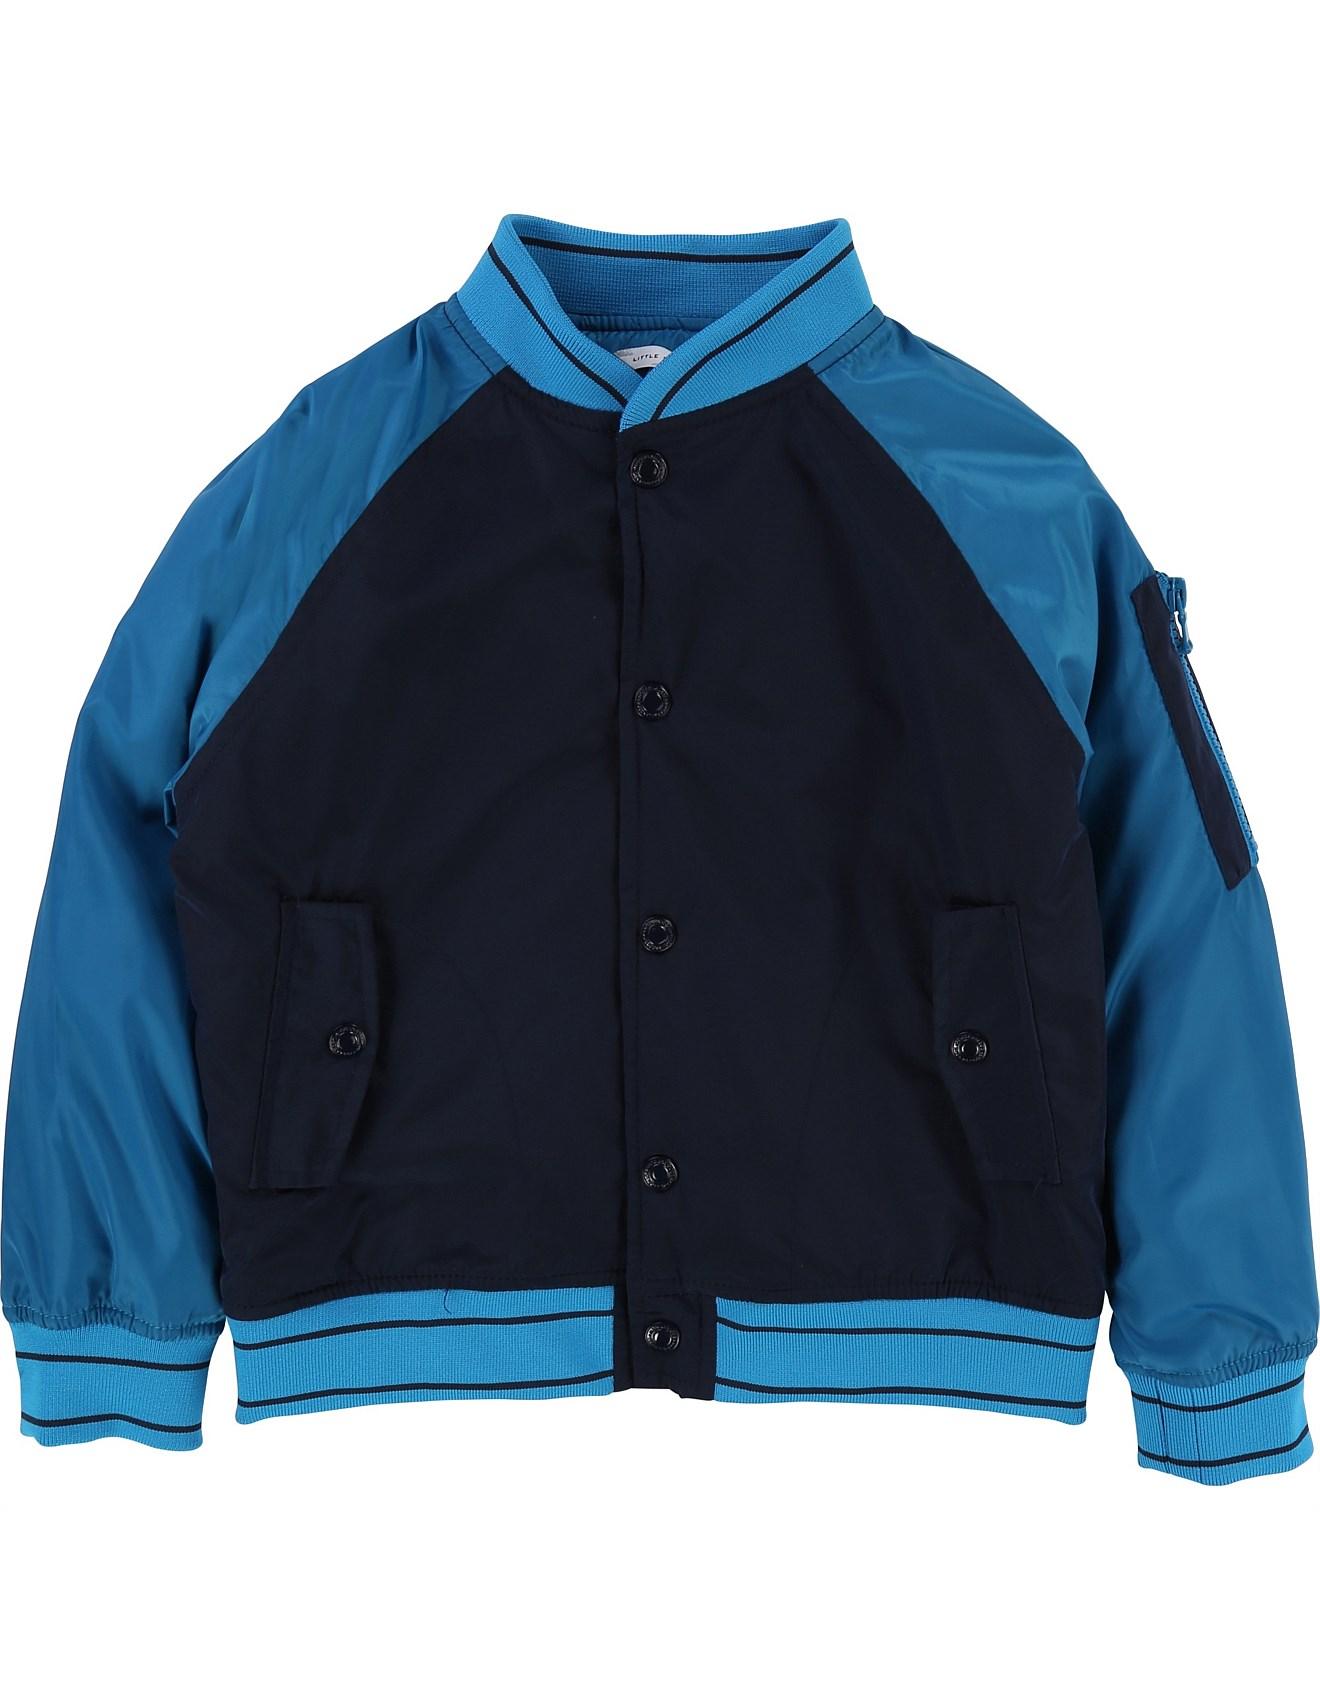 997f29356505 Boys - Pre Spring Boy Bomber Jacket(6-10 Years)